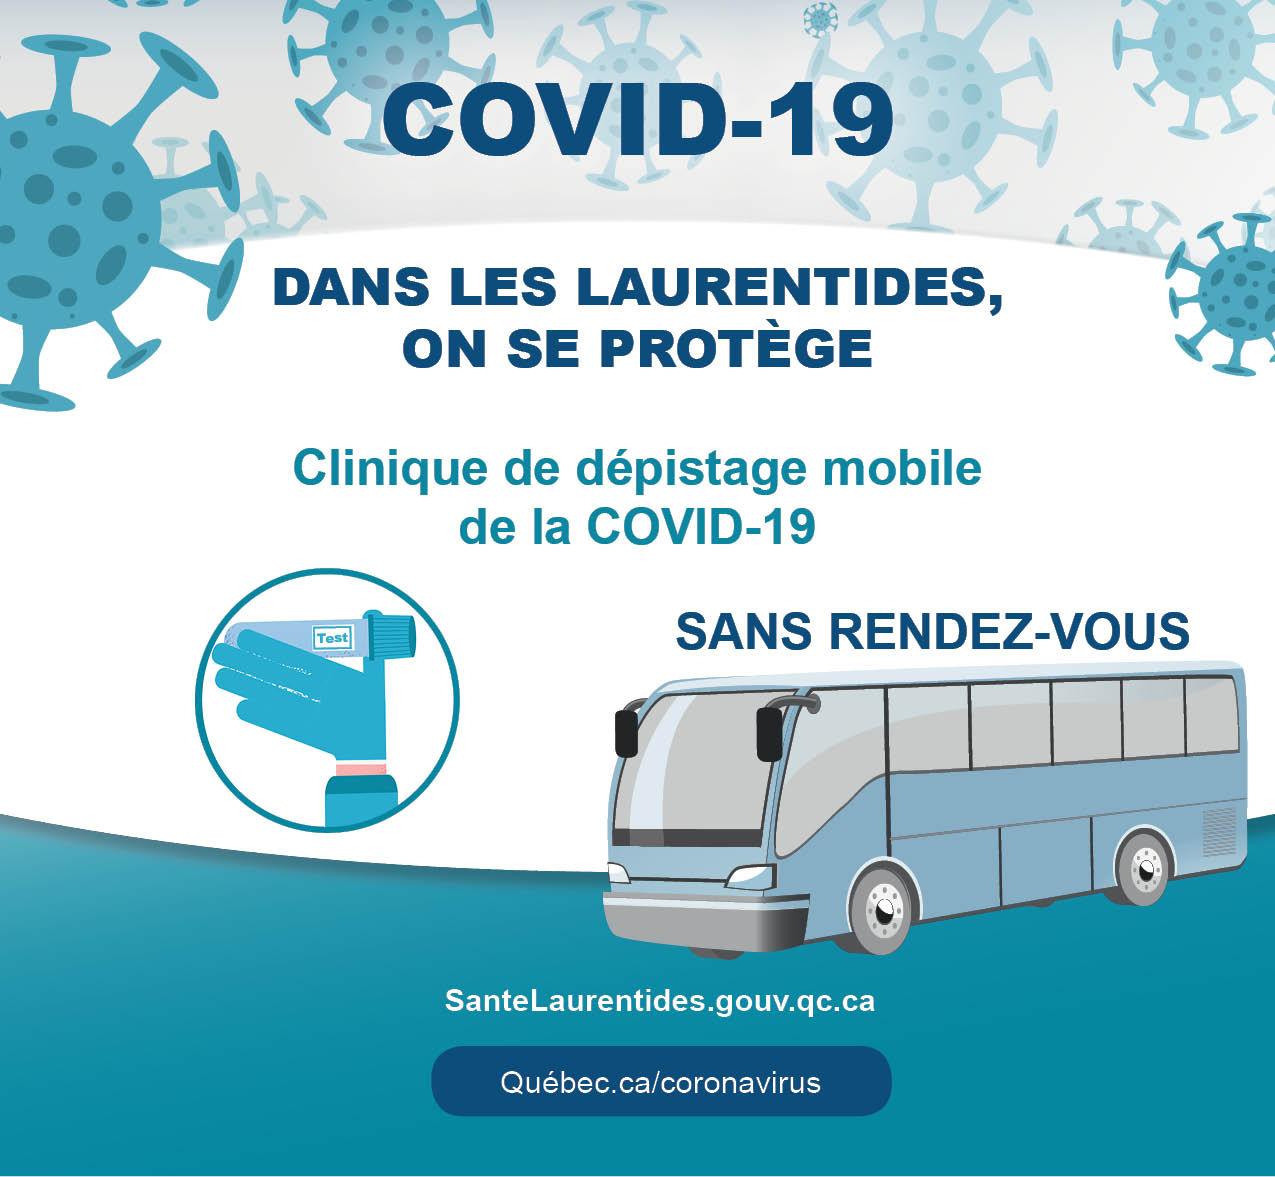 VisuelAutobus_2020-05-27.jpg (143 KB)